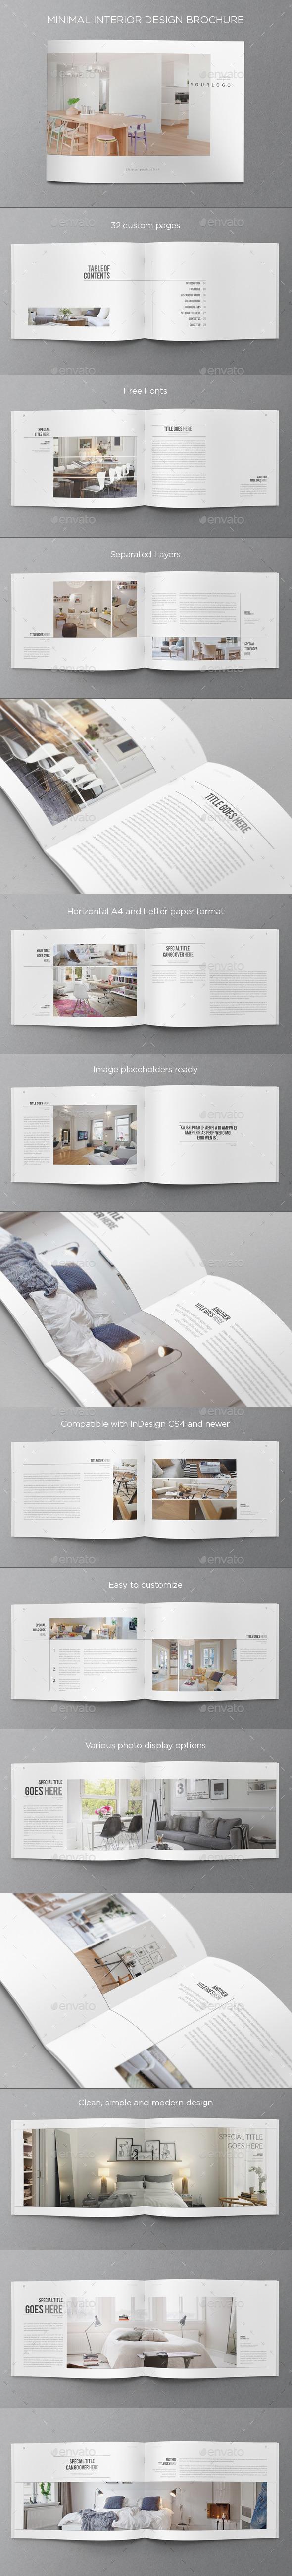 GraphicRiver Minimal Interior Design Brochure 8925678